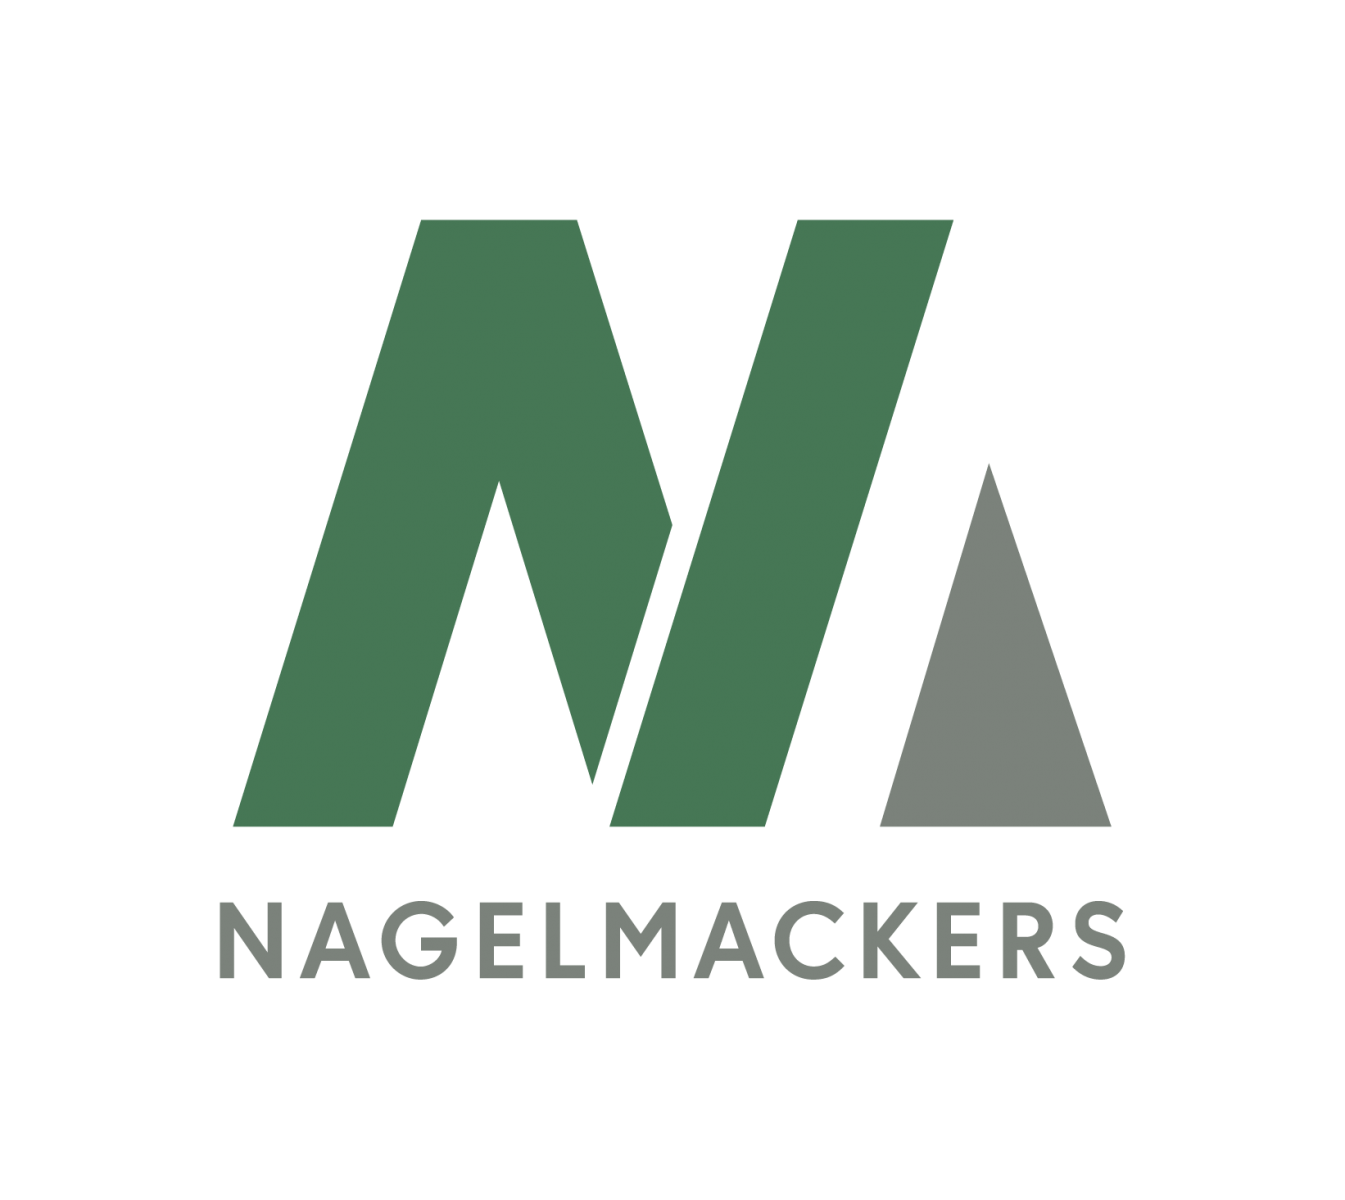 Nagelmackers_logo_vert_Q-01